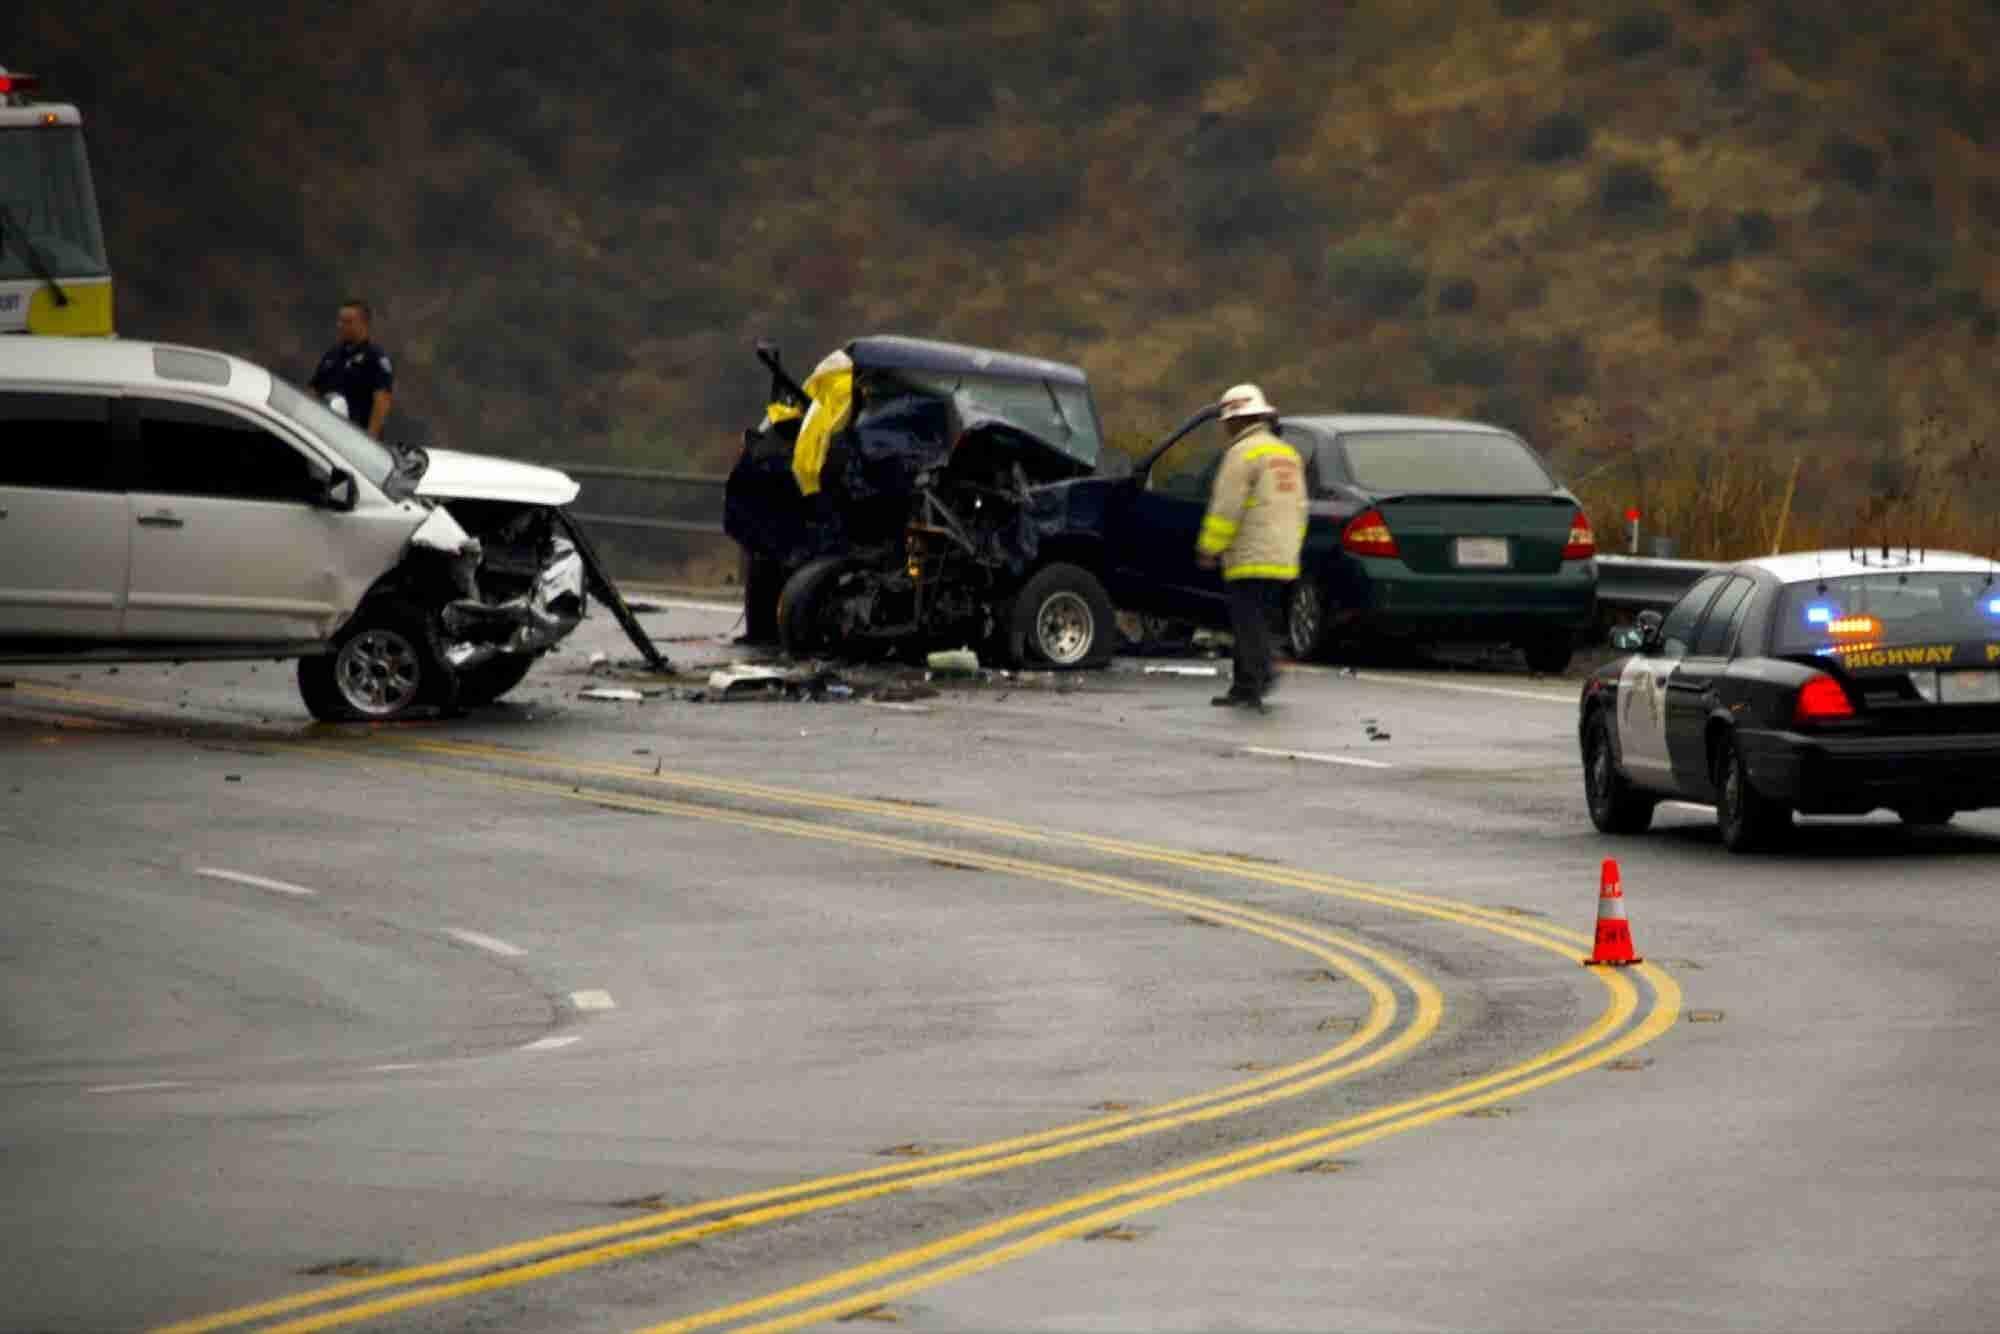 Study Links Medical Marijuana to Fewer Traffic Fatalities